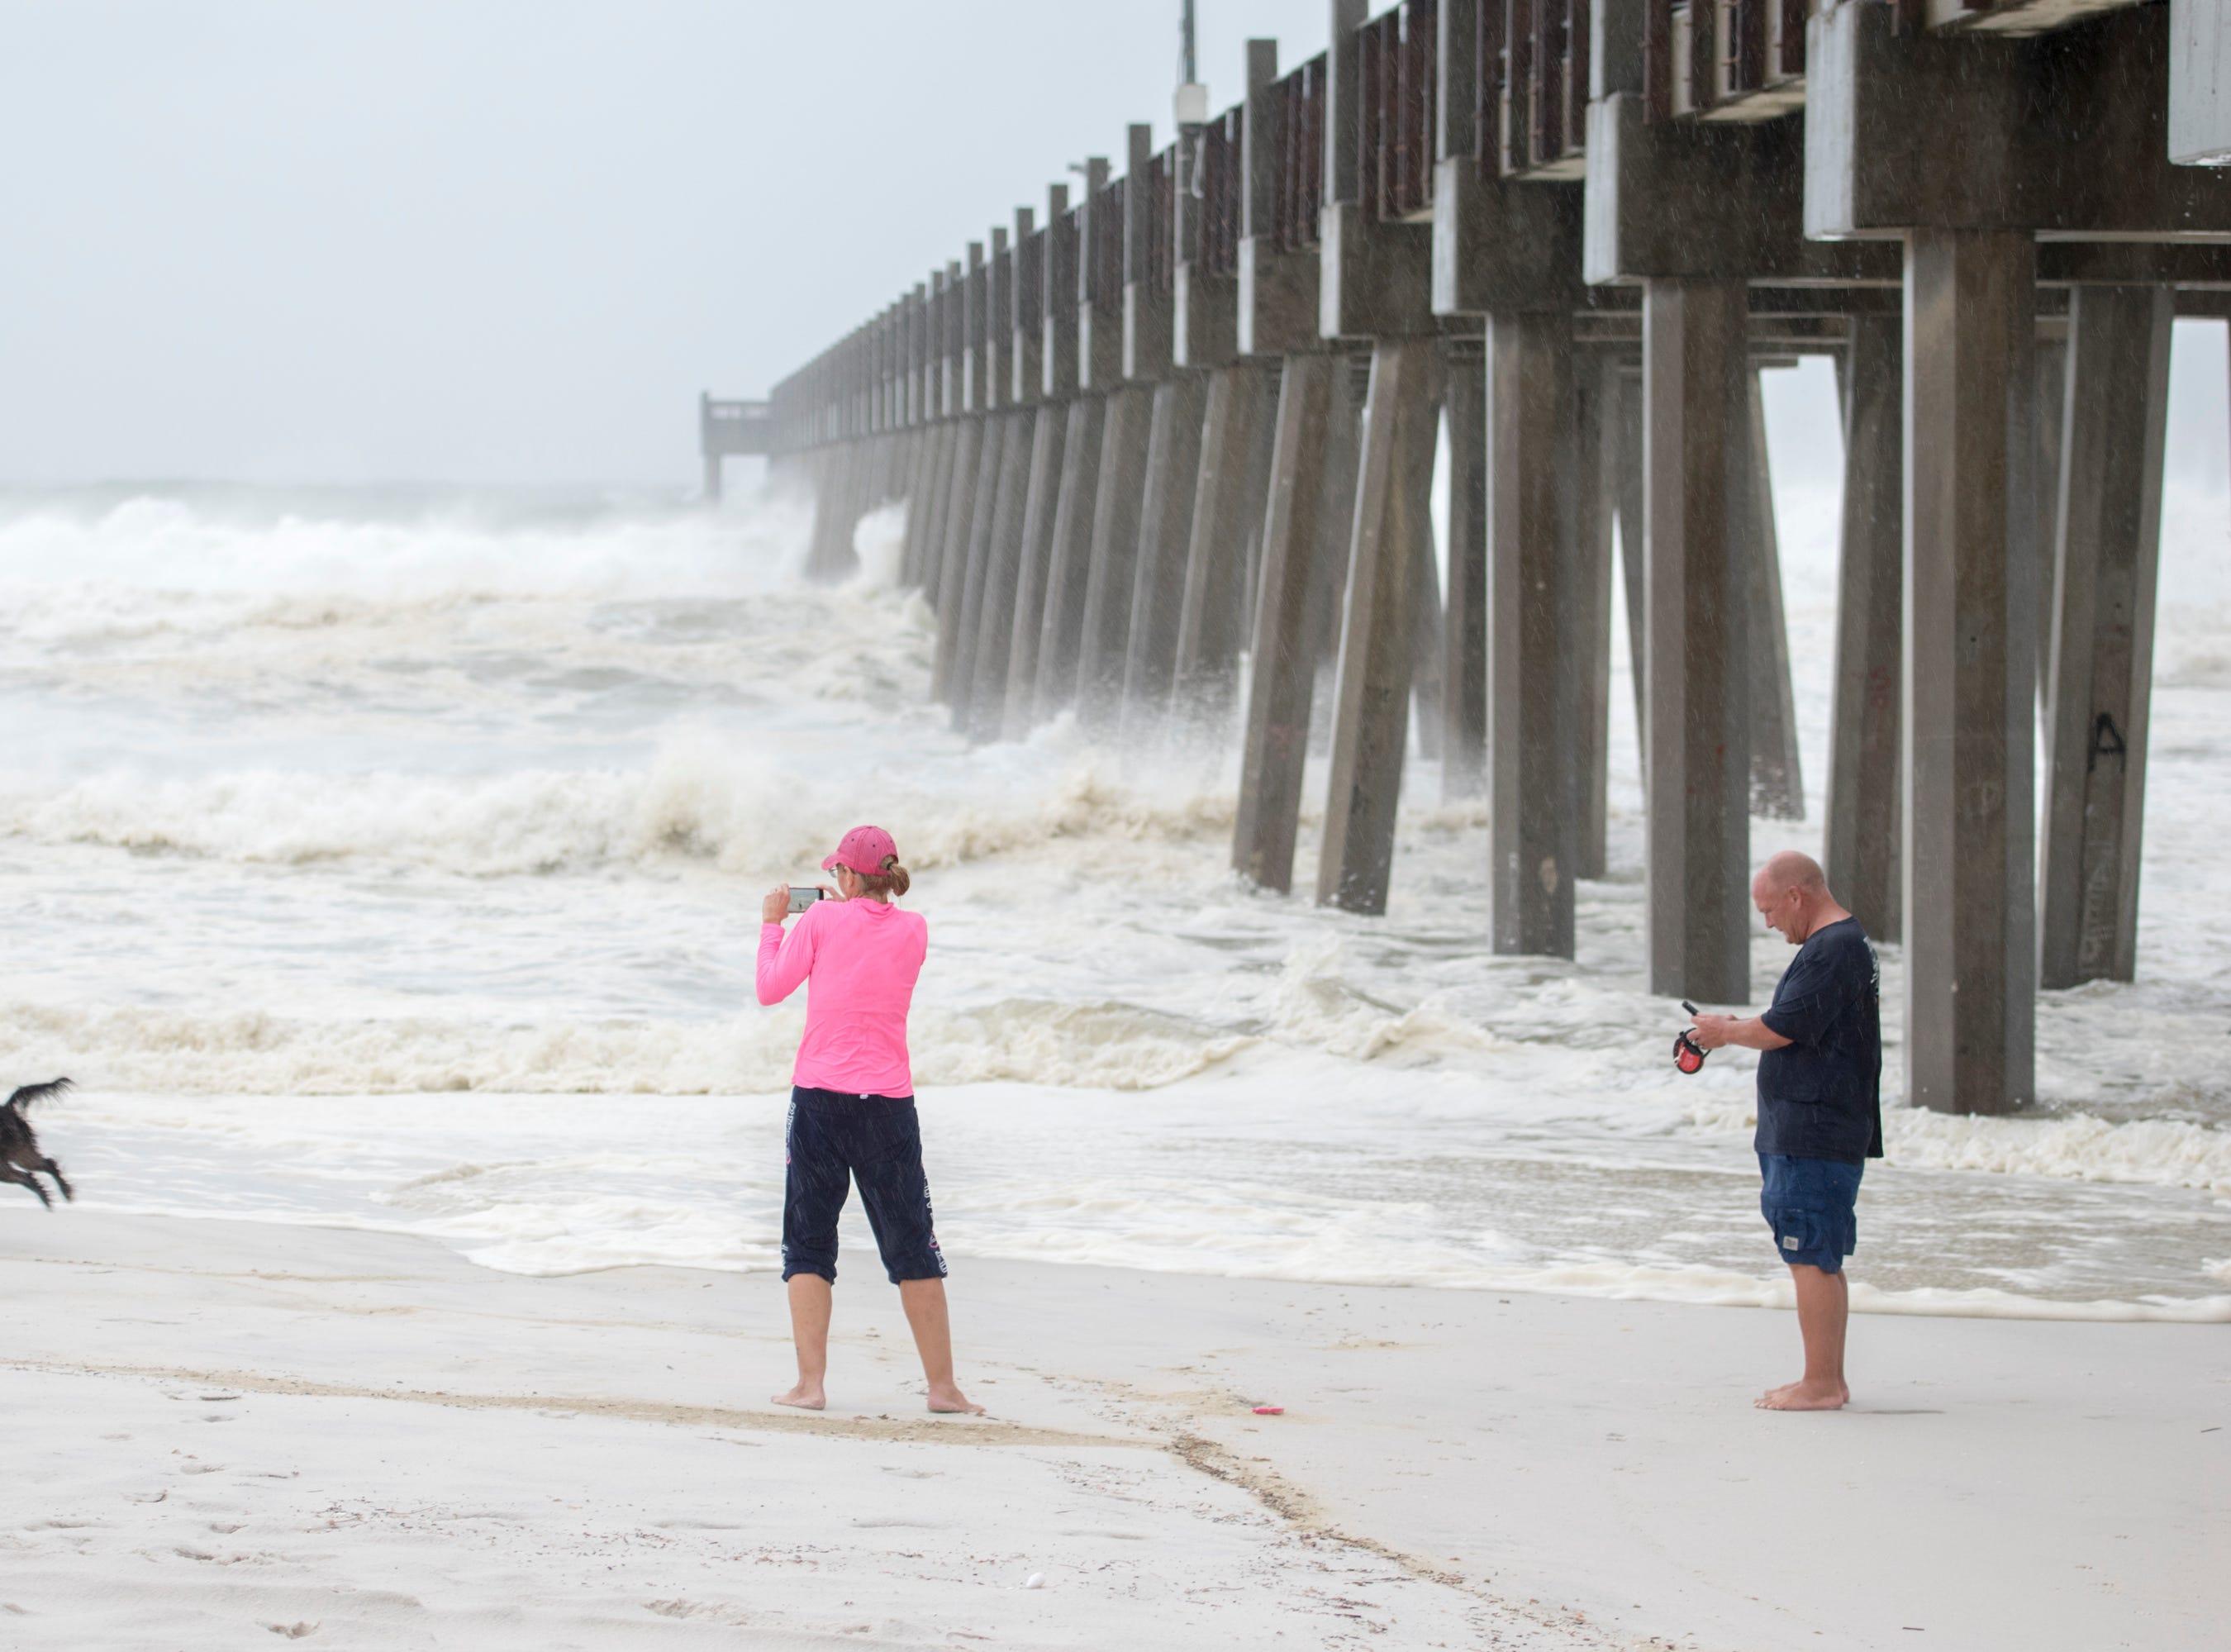 Lisa and Gene Murphy walk their dog Sammy along Casino Beach as Hurricane Michael arrives in Pensacola on Wednesday, October 10, 2018.